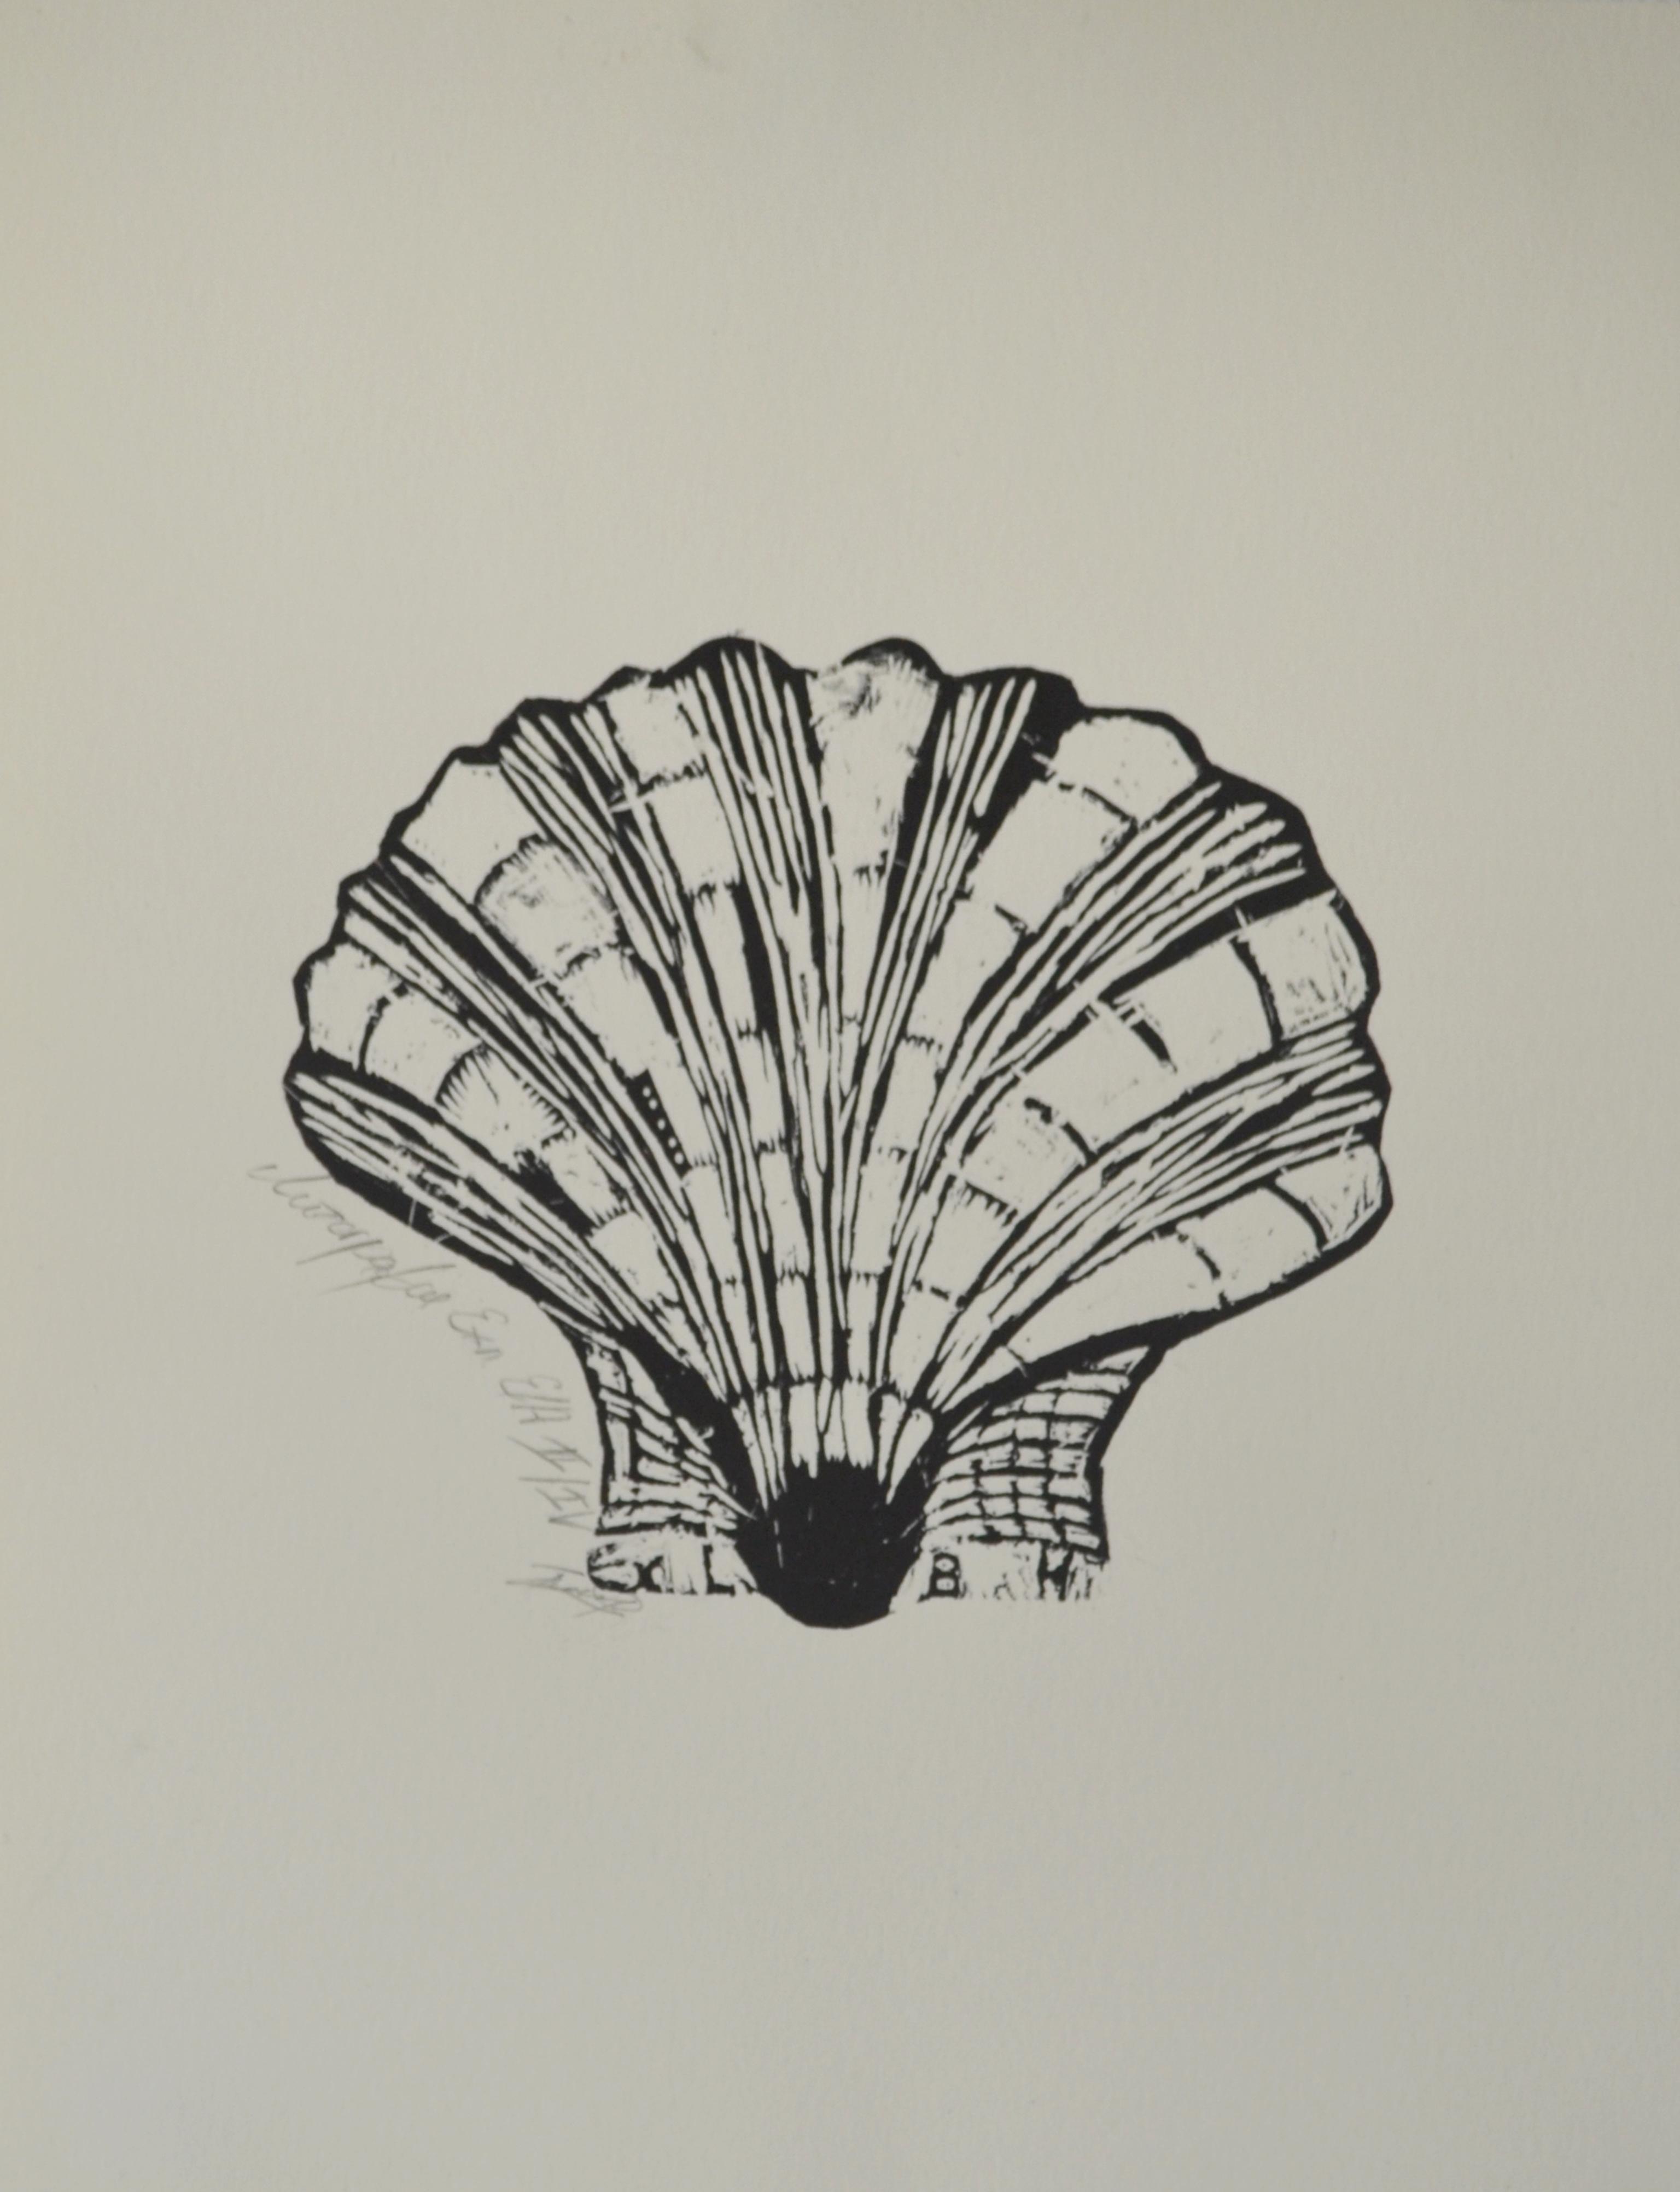 "Борислава Каракашева, специалност ""Изобразително изкуство"", Мида, 2018 /  Borislava Karakasheva, degree programme ""Fine Arts"", Sea Shell, 2018"